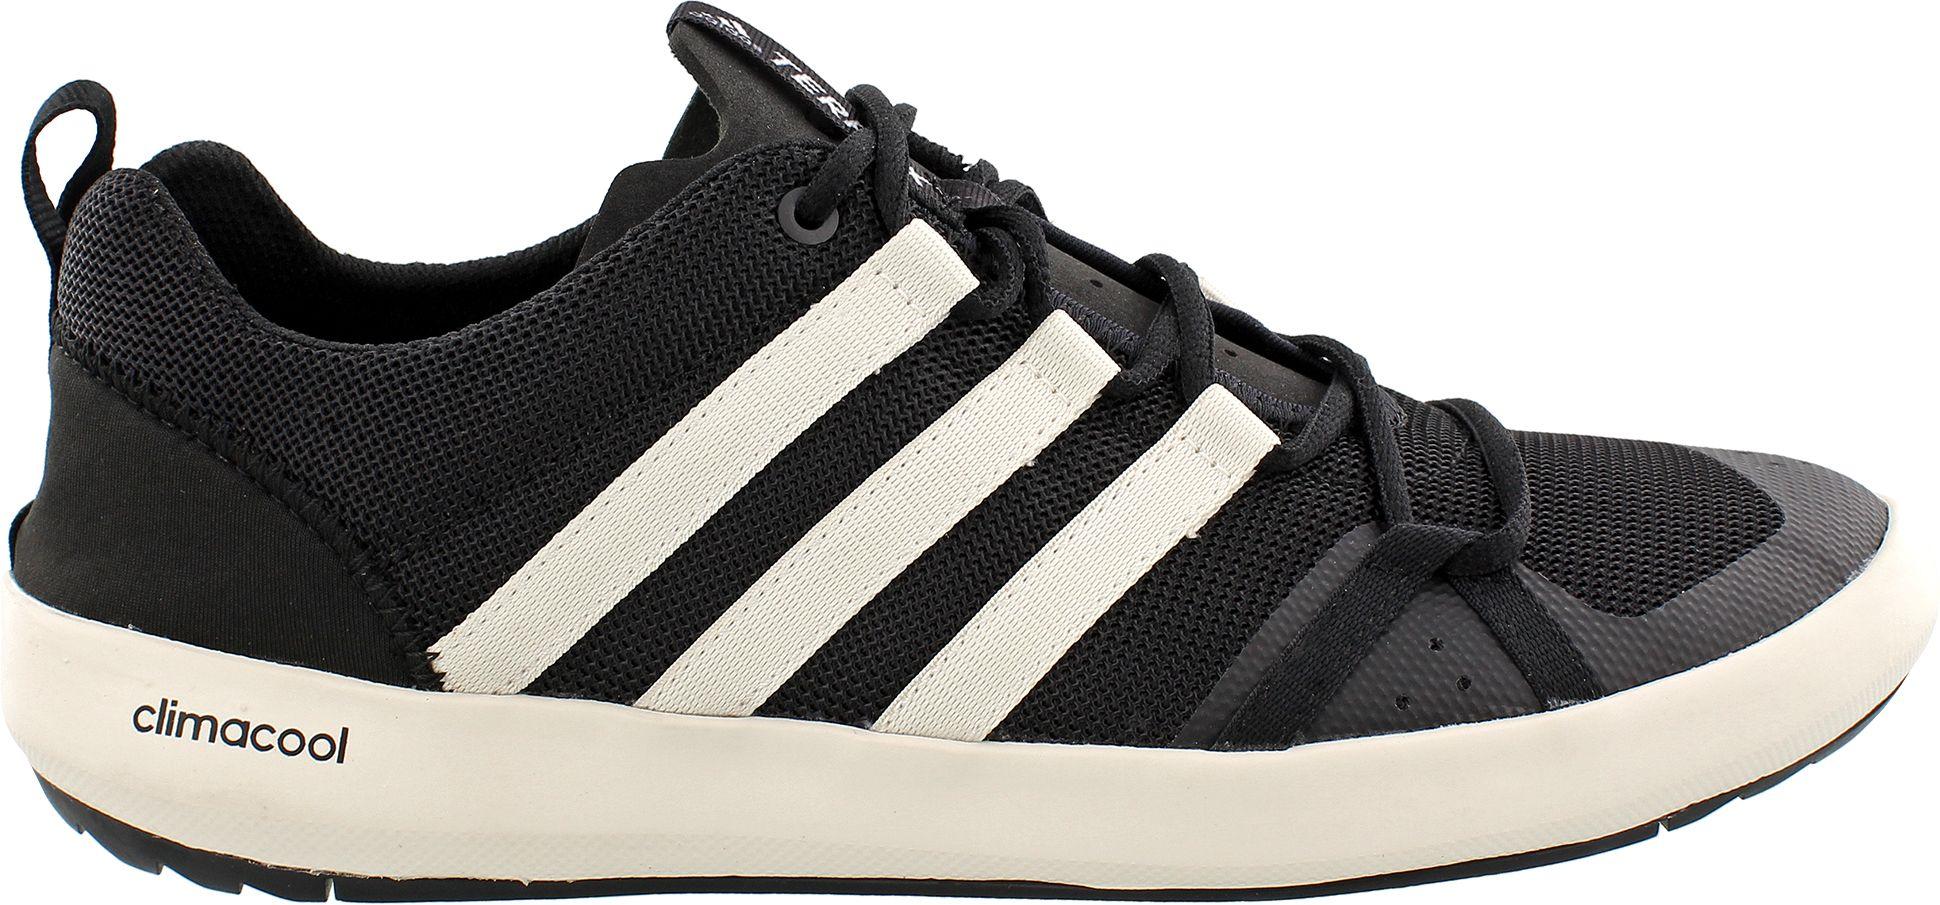 Adidas Men S Climacool Golf Shoes Olive